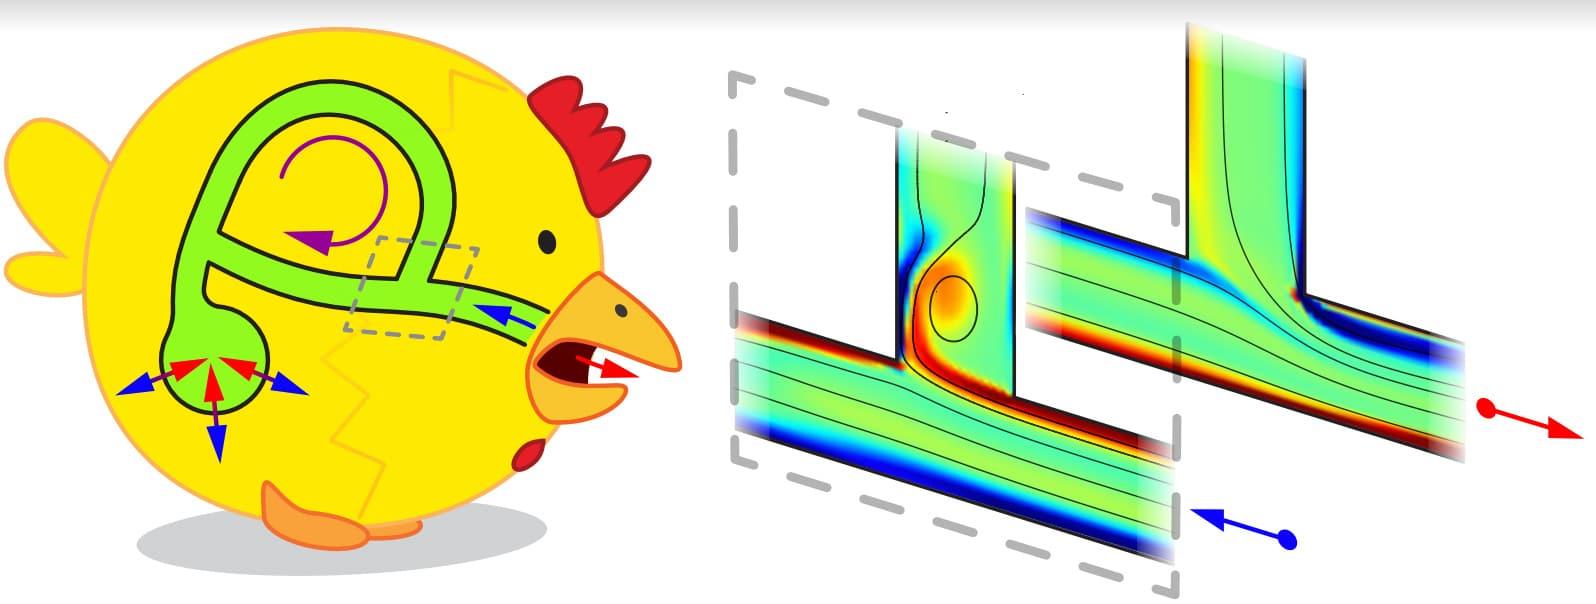 spherical cartoon chicken with looped airflow diagram overlay